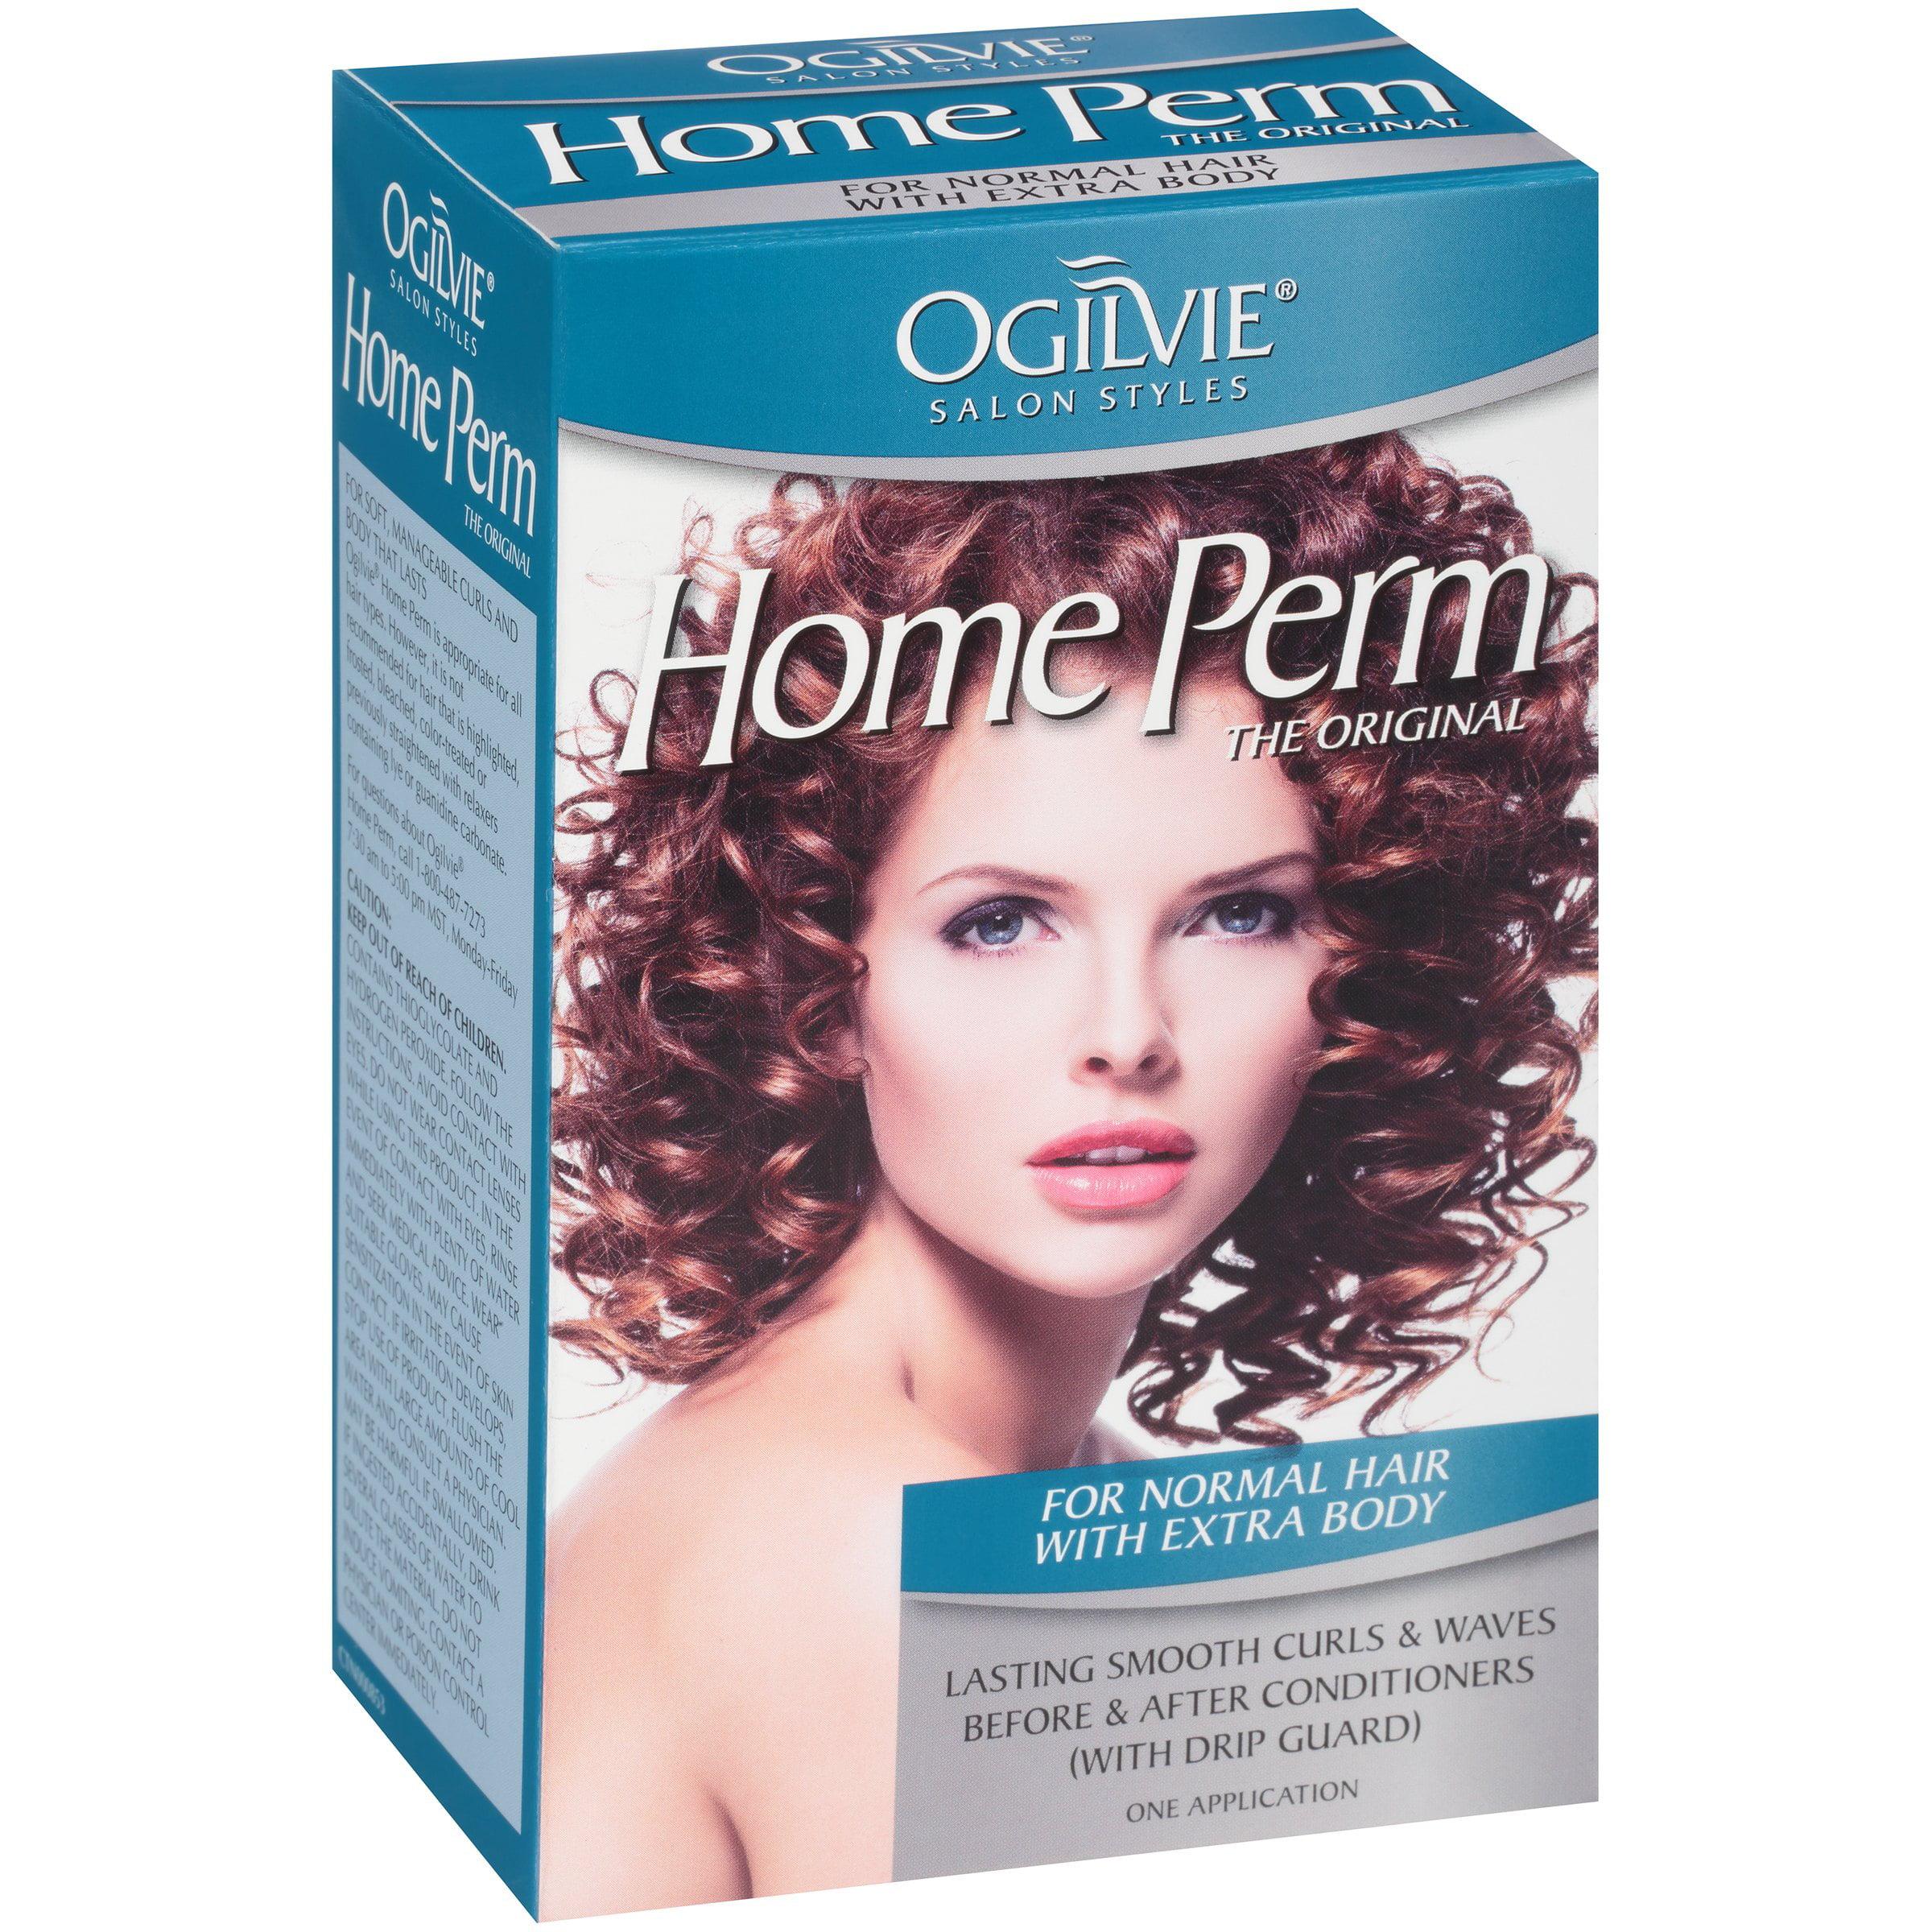 Ogilvie salon styles the original for normal hair wextra body home ogilvie salon styles the original for normal hair wextra body home perm 1 ct box walmart solutioingenieria Choice Image